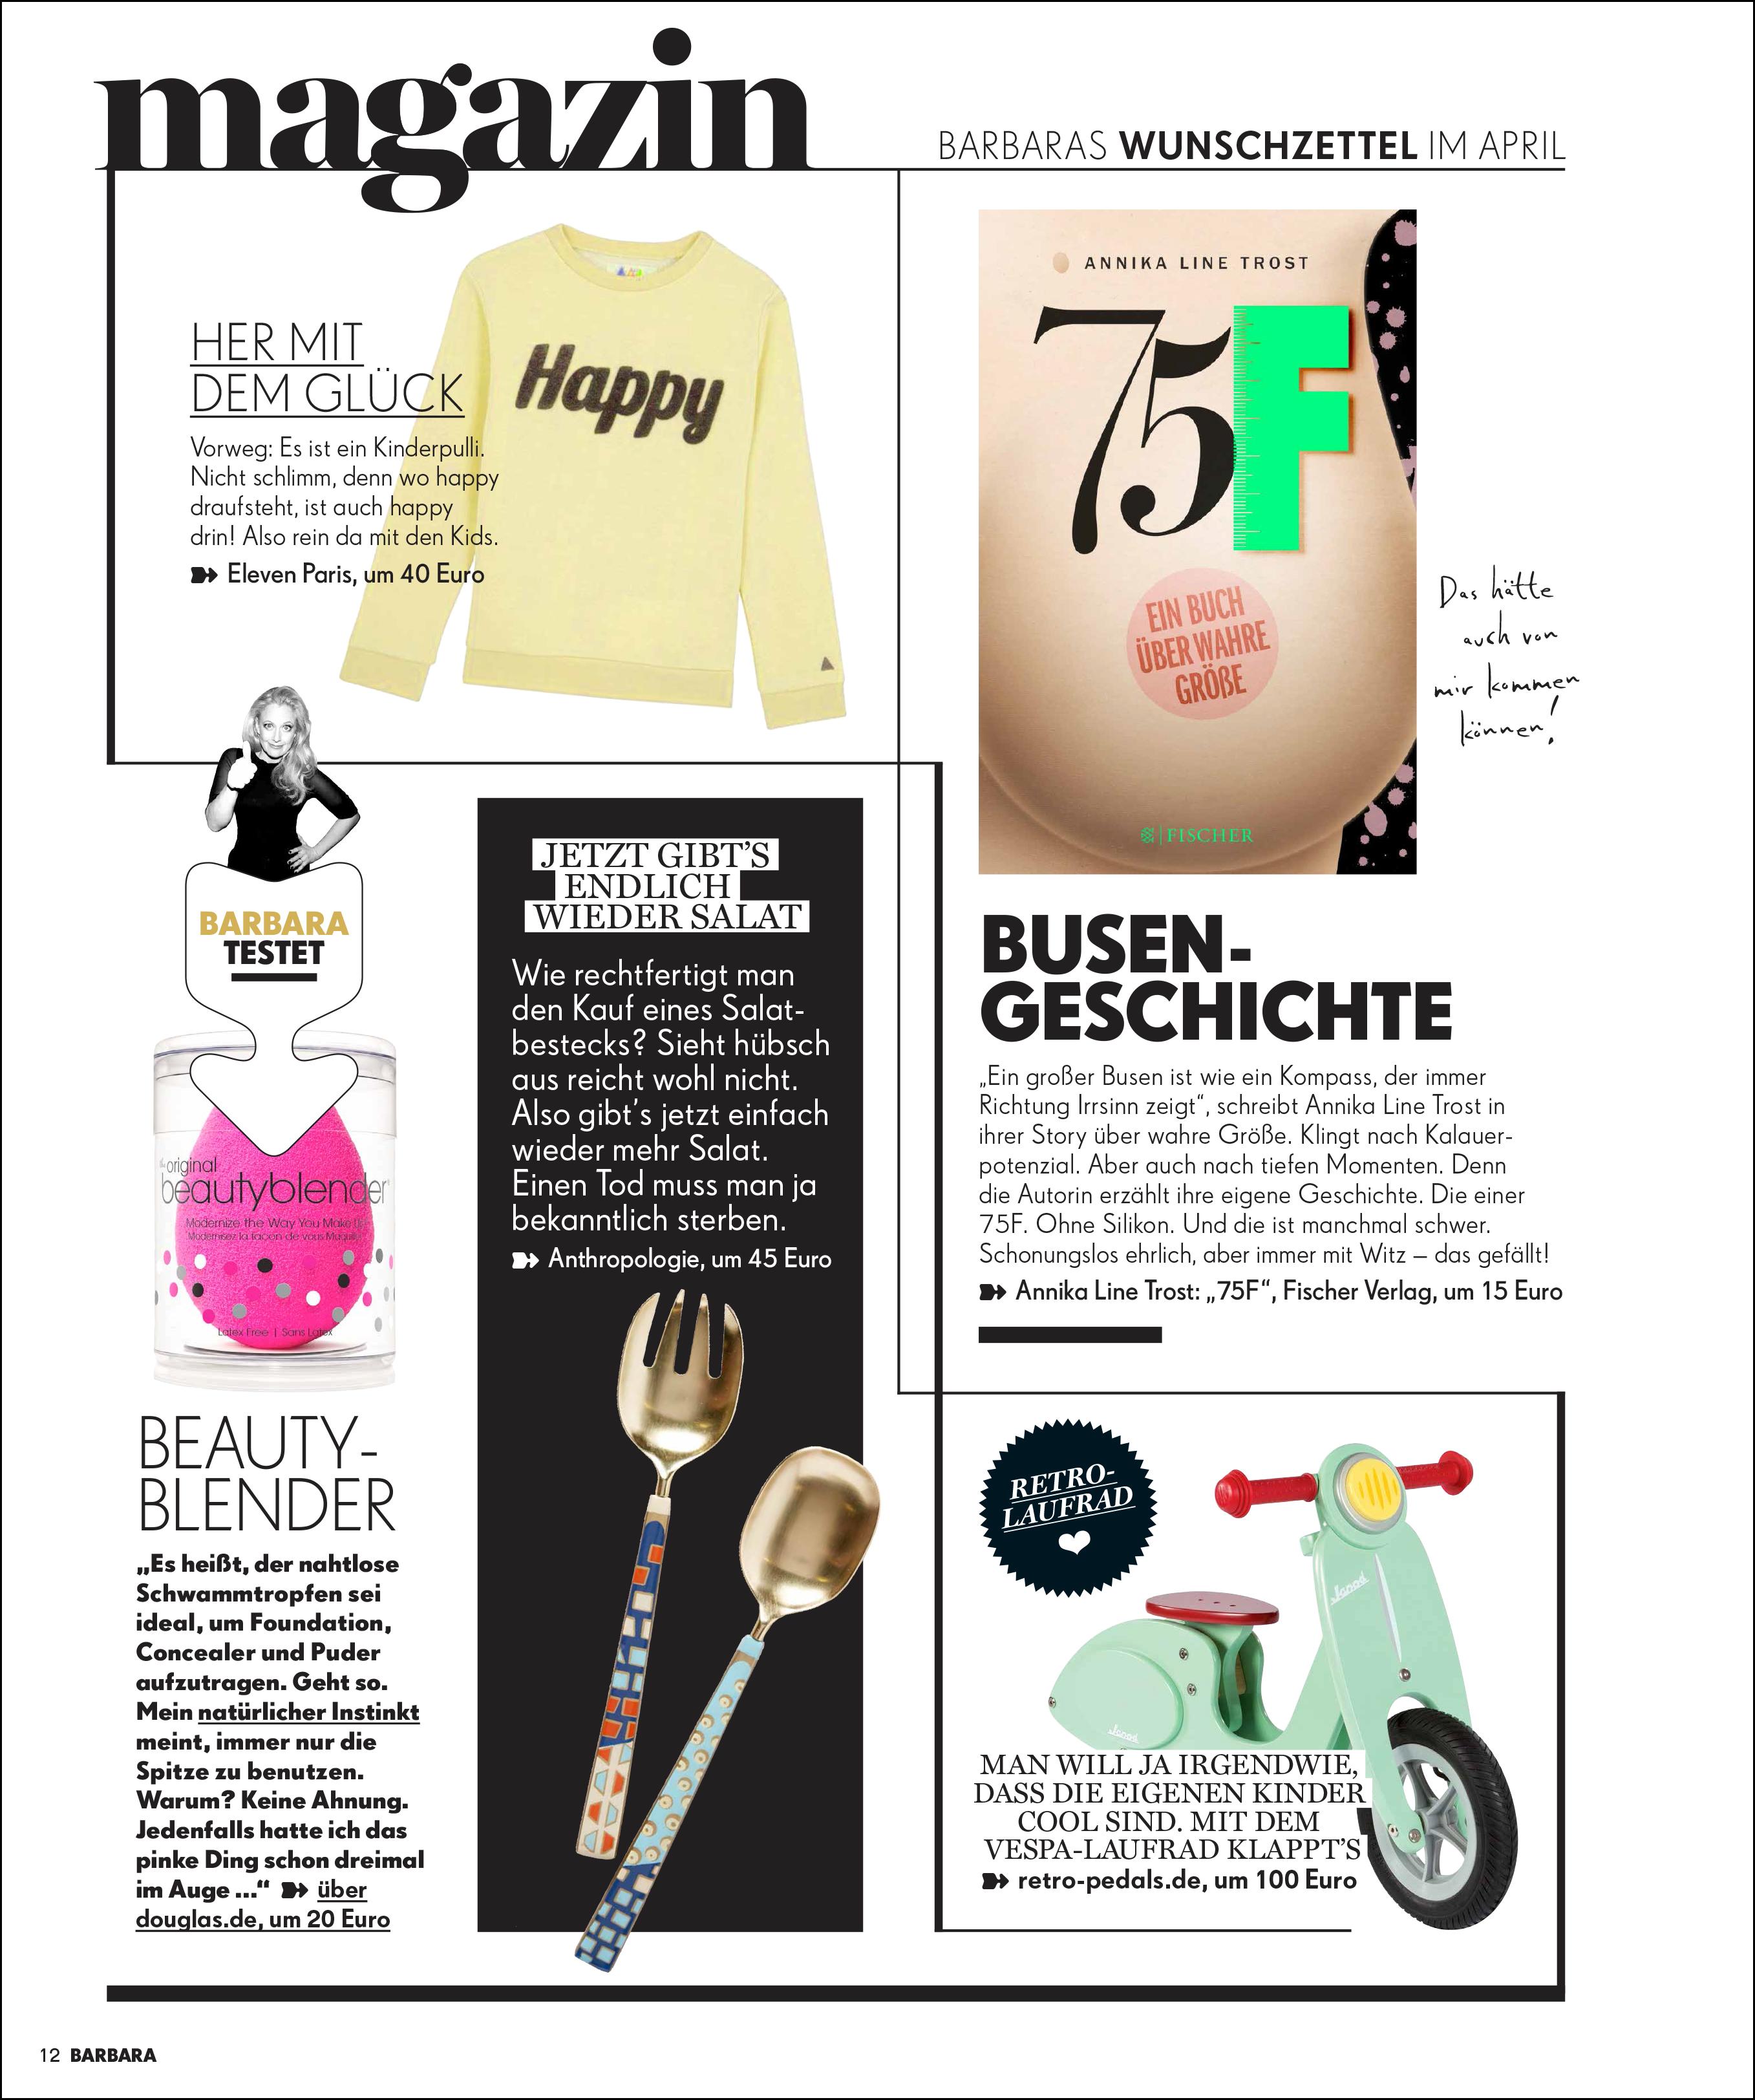 010_Magazin-2